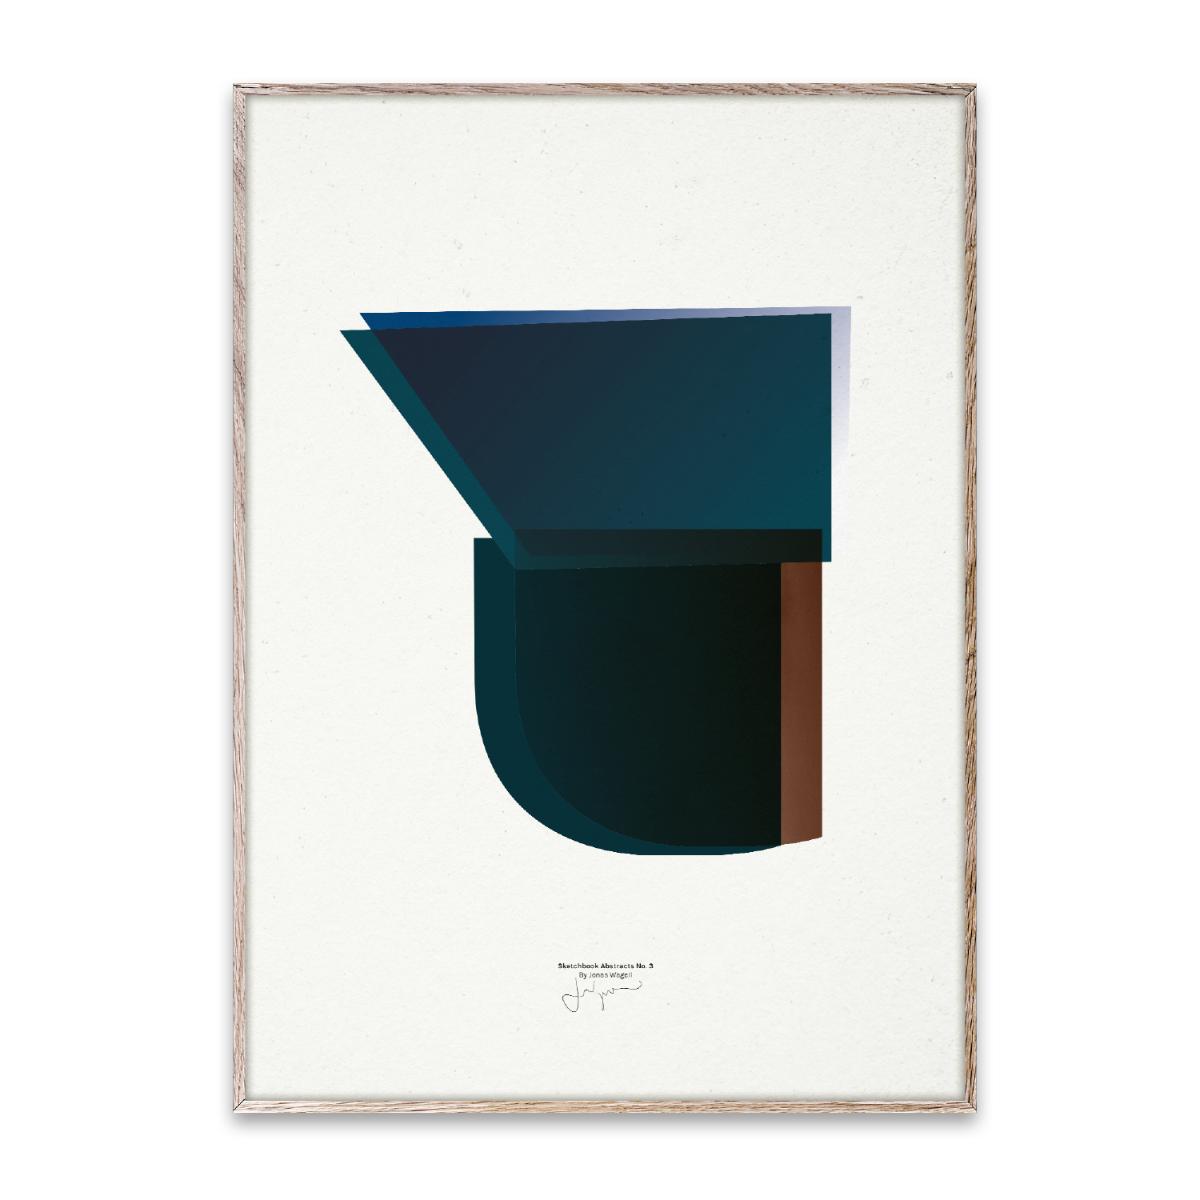 Designtorget Poster Sketchbook Abstracts 03 50x70 cm